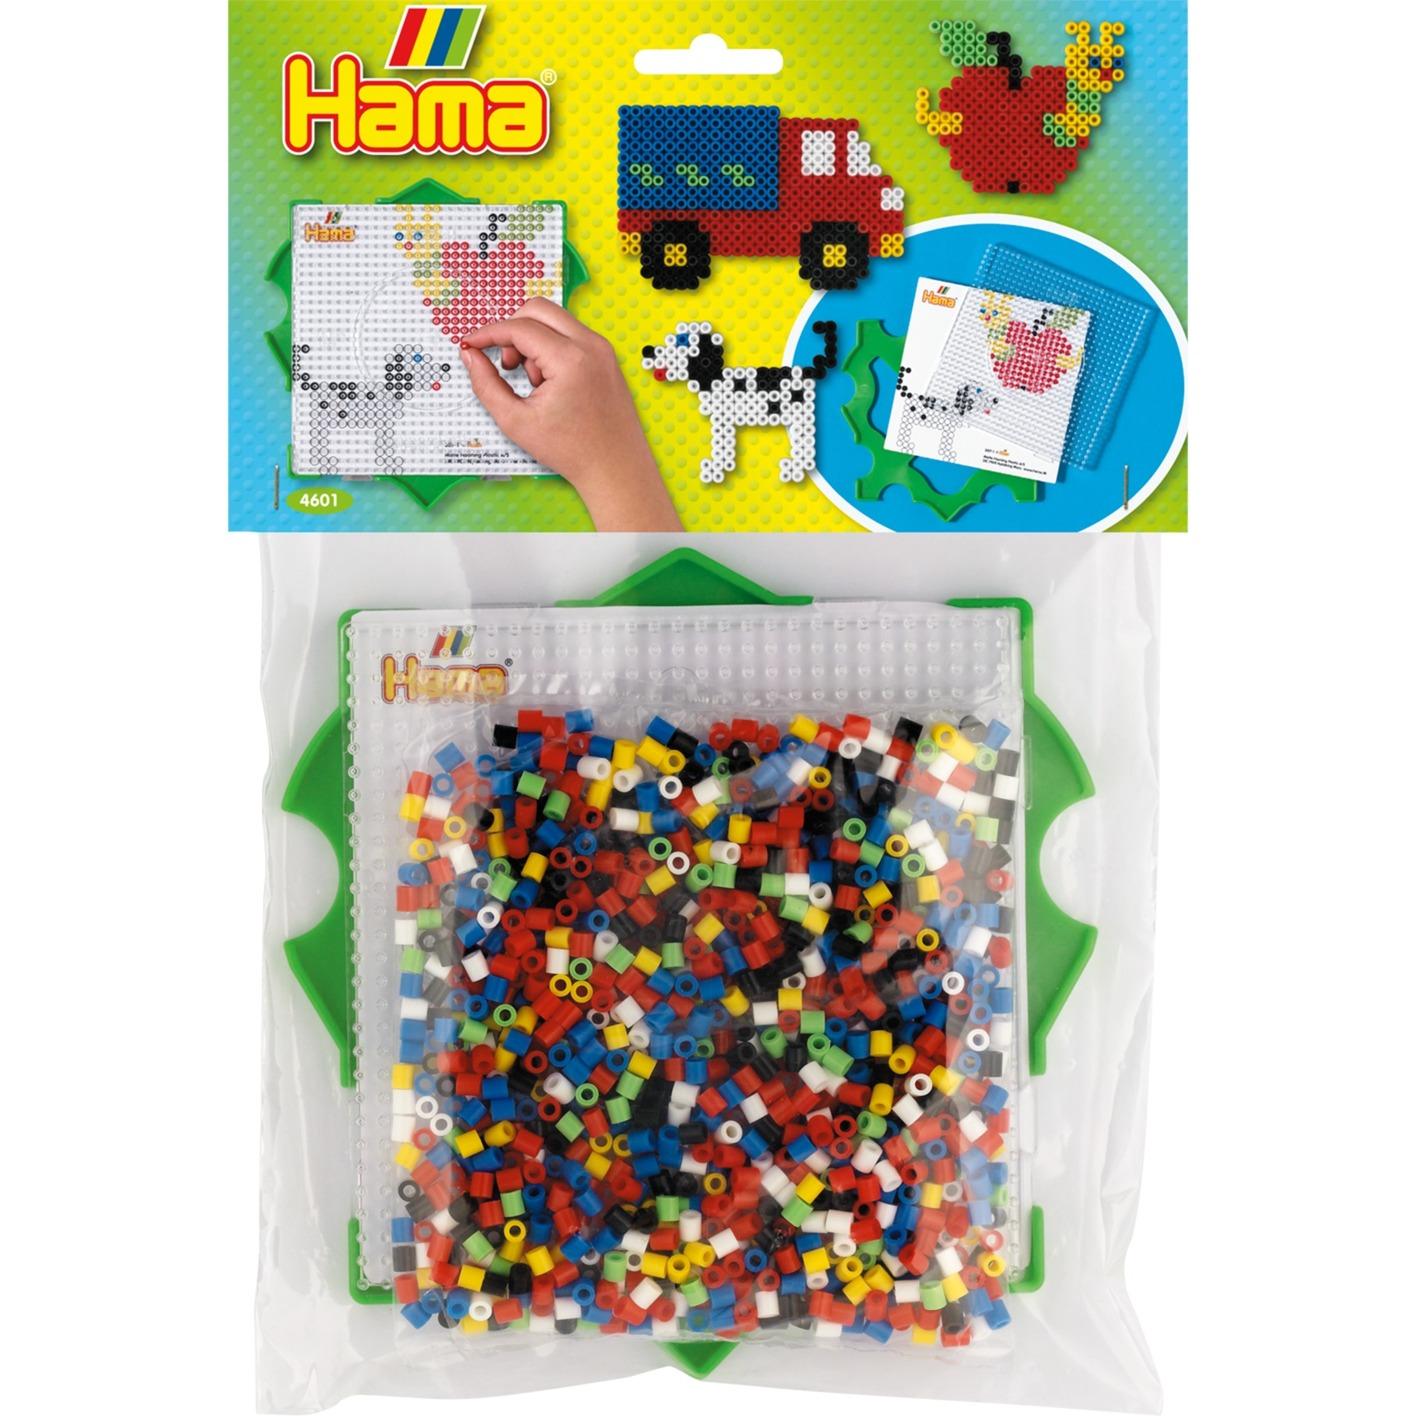 Hama Bügelperlen Multi-Rahmen mit Perlen, Basteln rot, 1000 Perlen